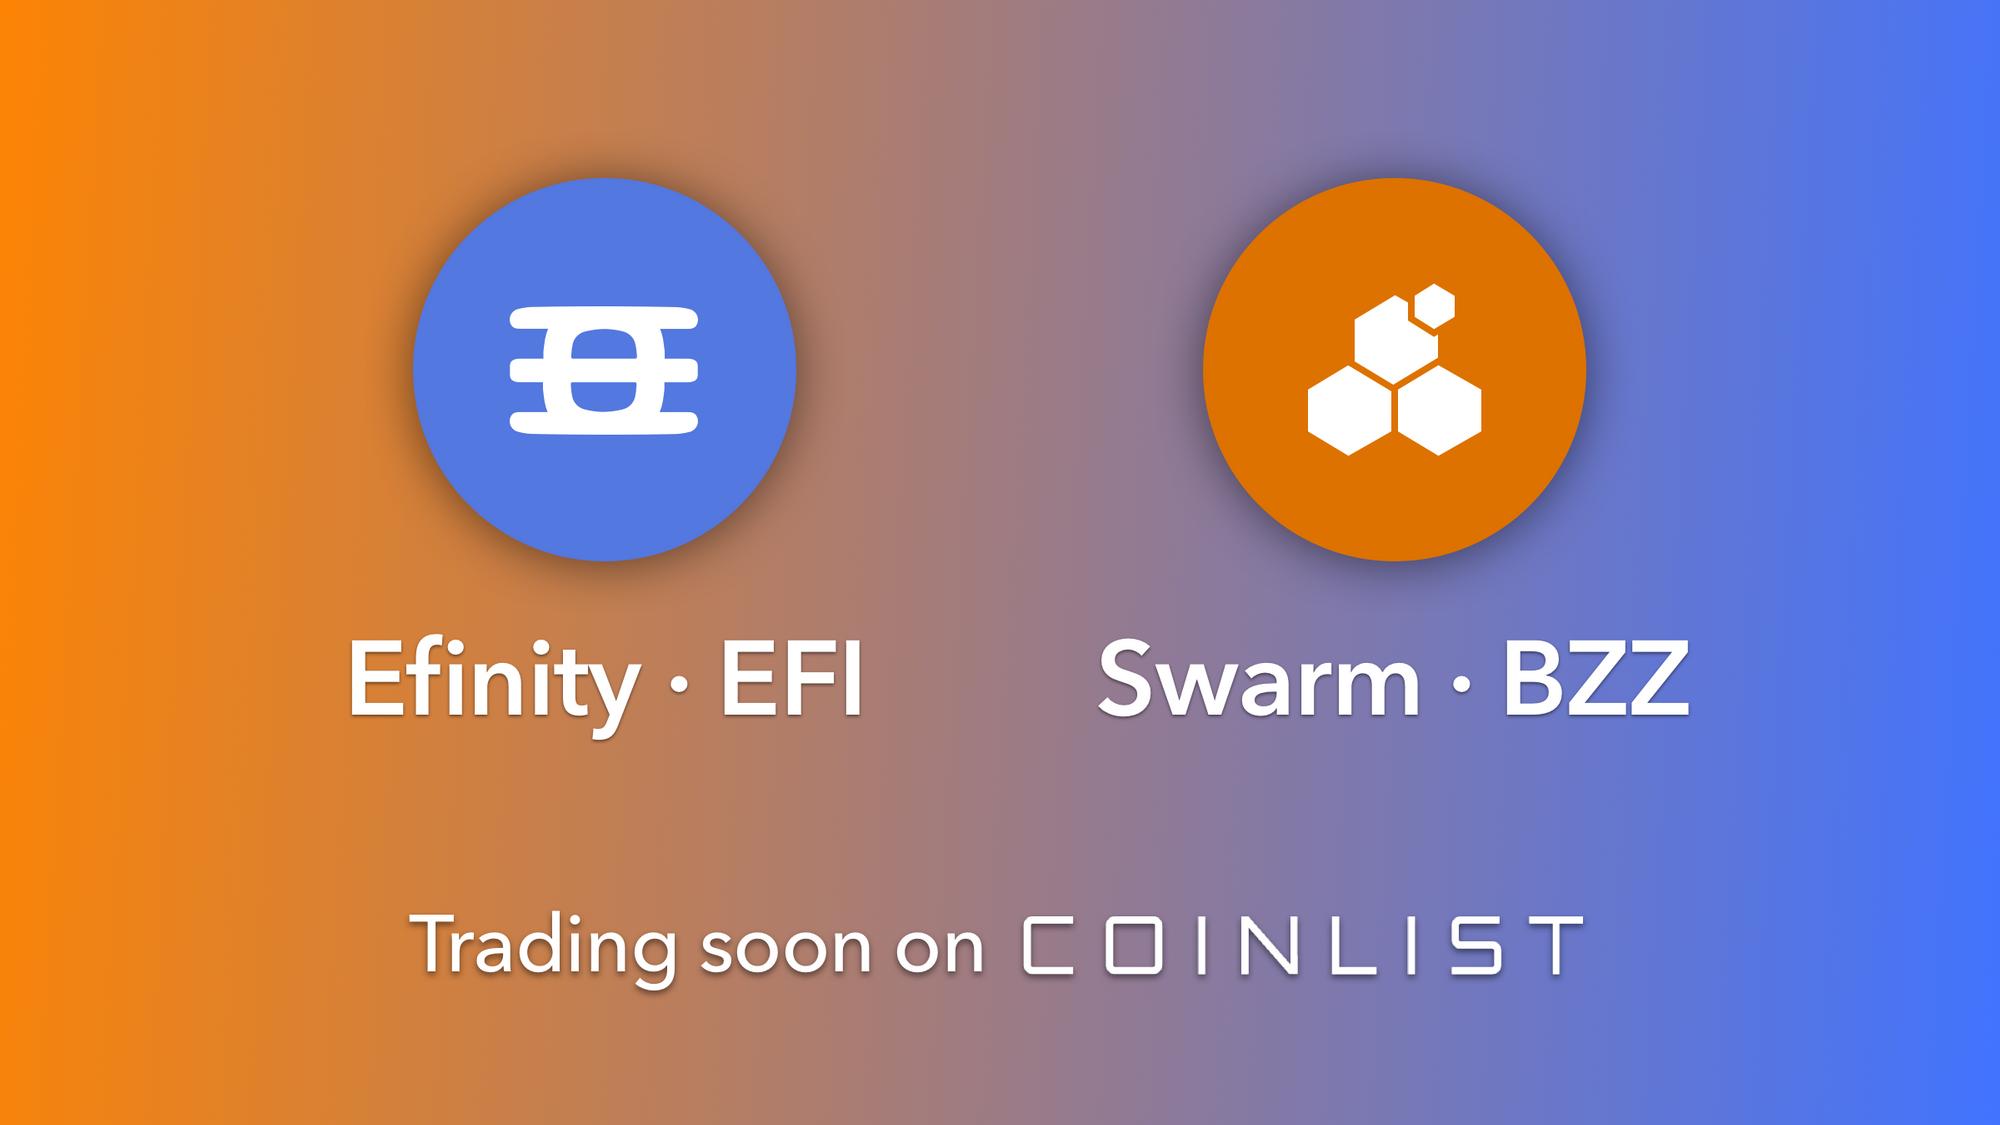 Efinity (EFI) and Swarm (BZZ) Trading Soon on CoinList